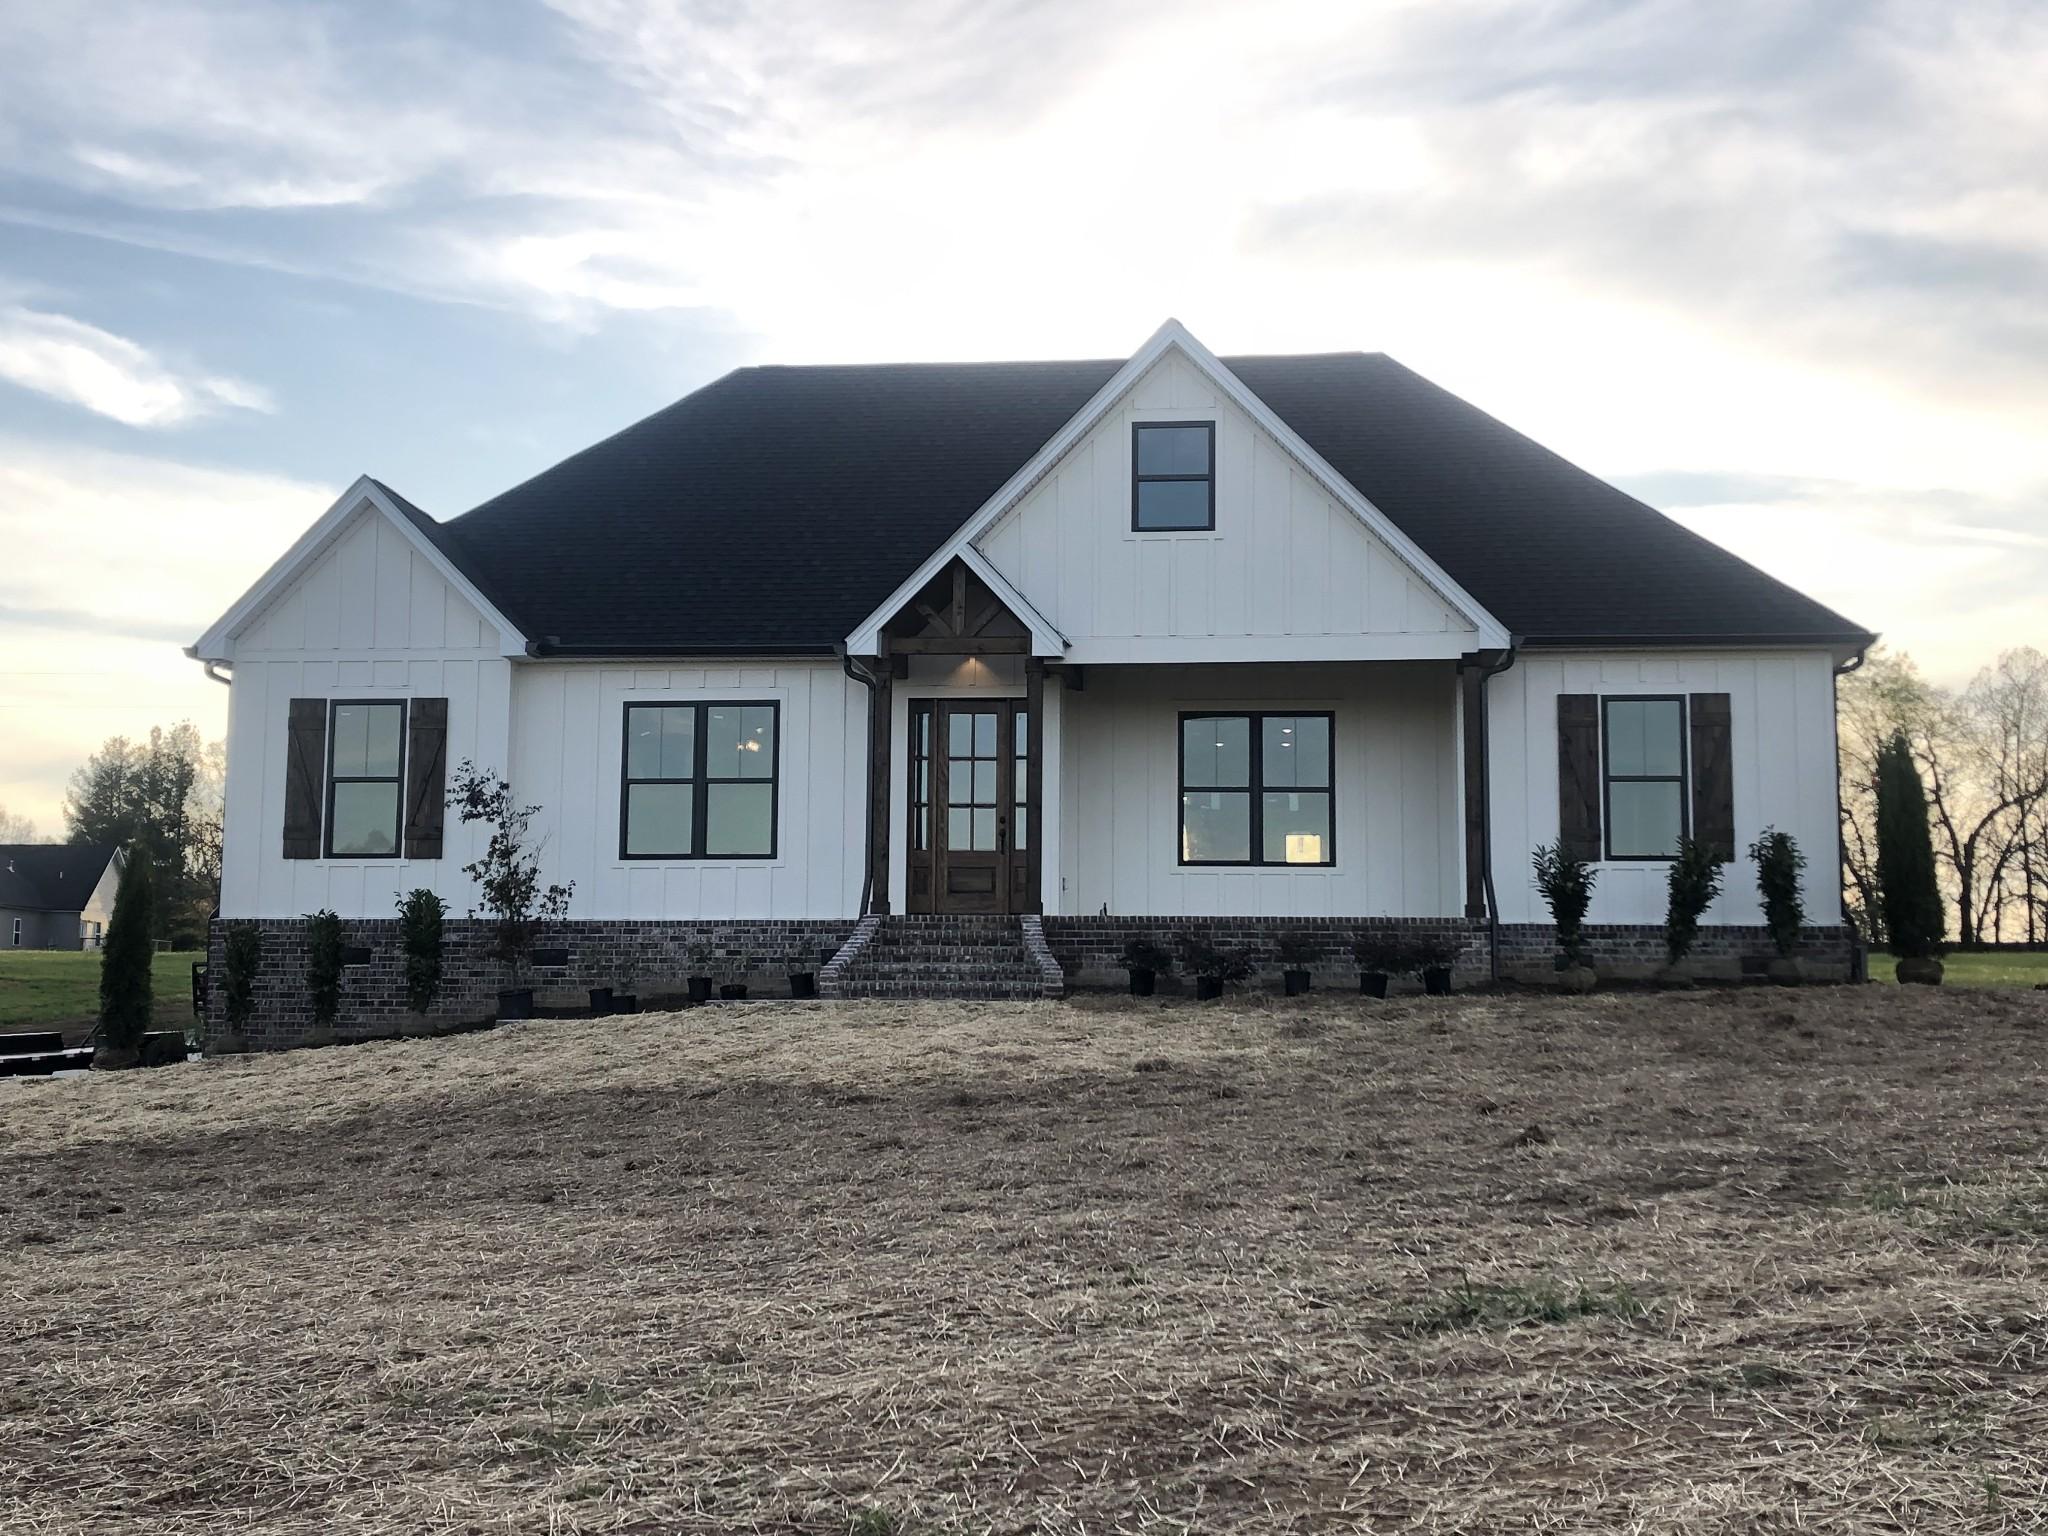 554 Buddy Rd, Burns, TN 37029 - Burns, TN real estate listing